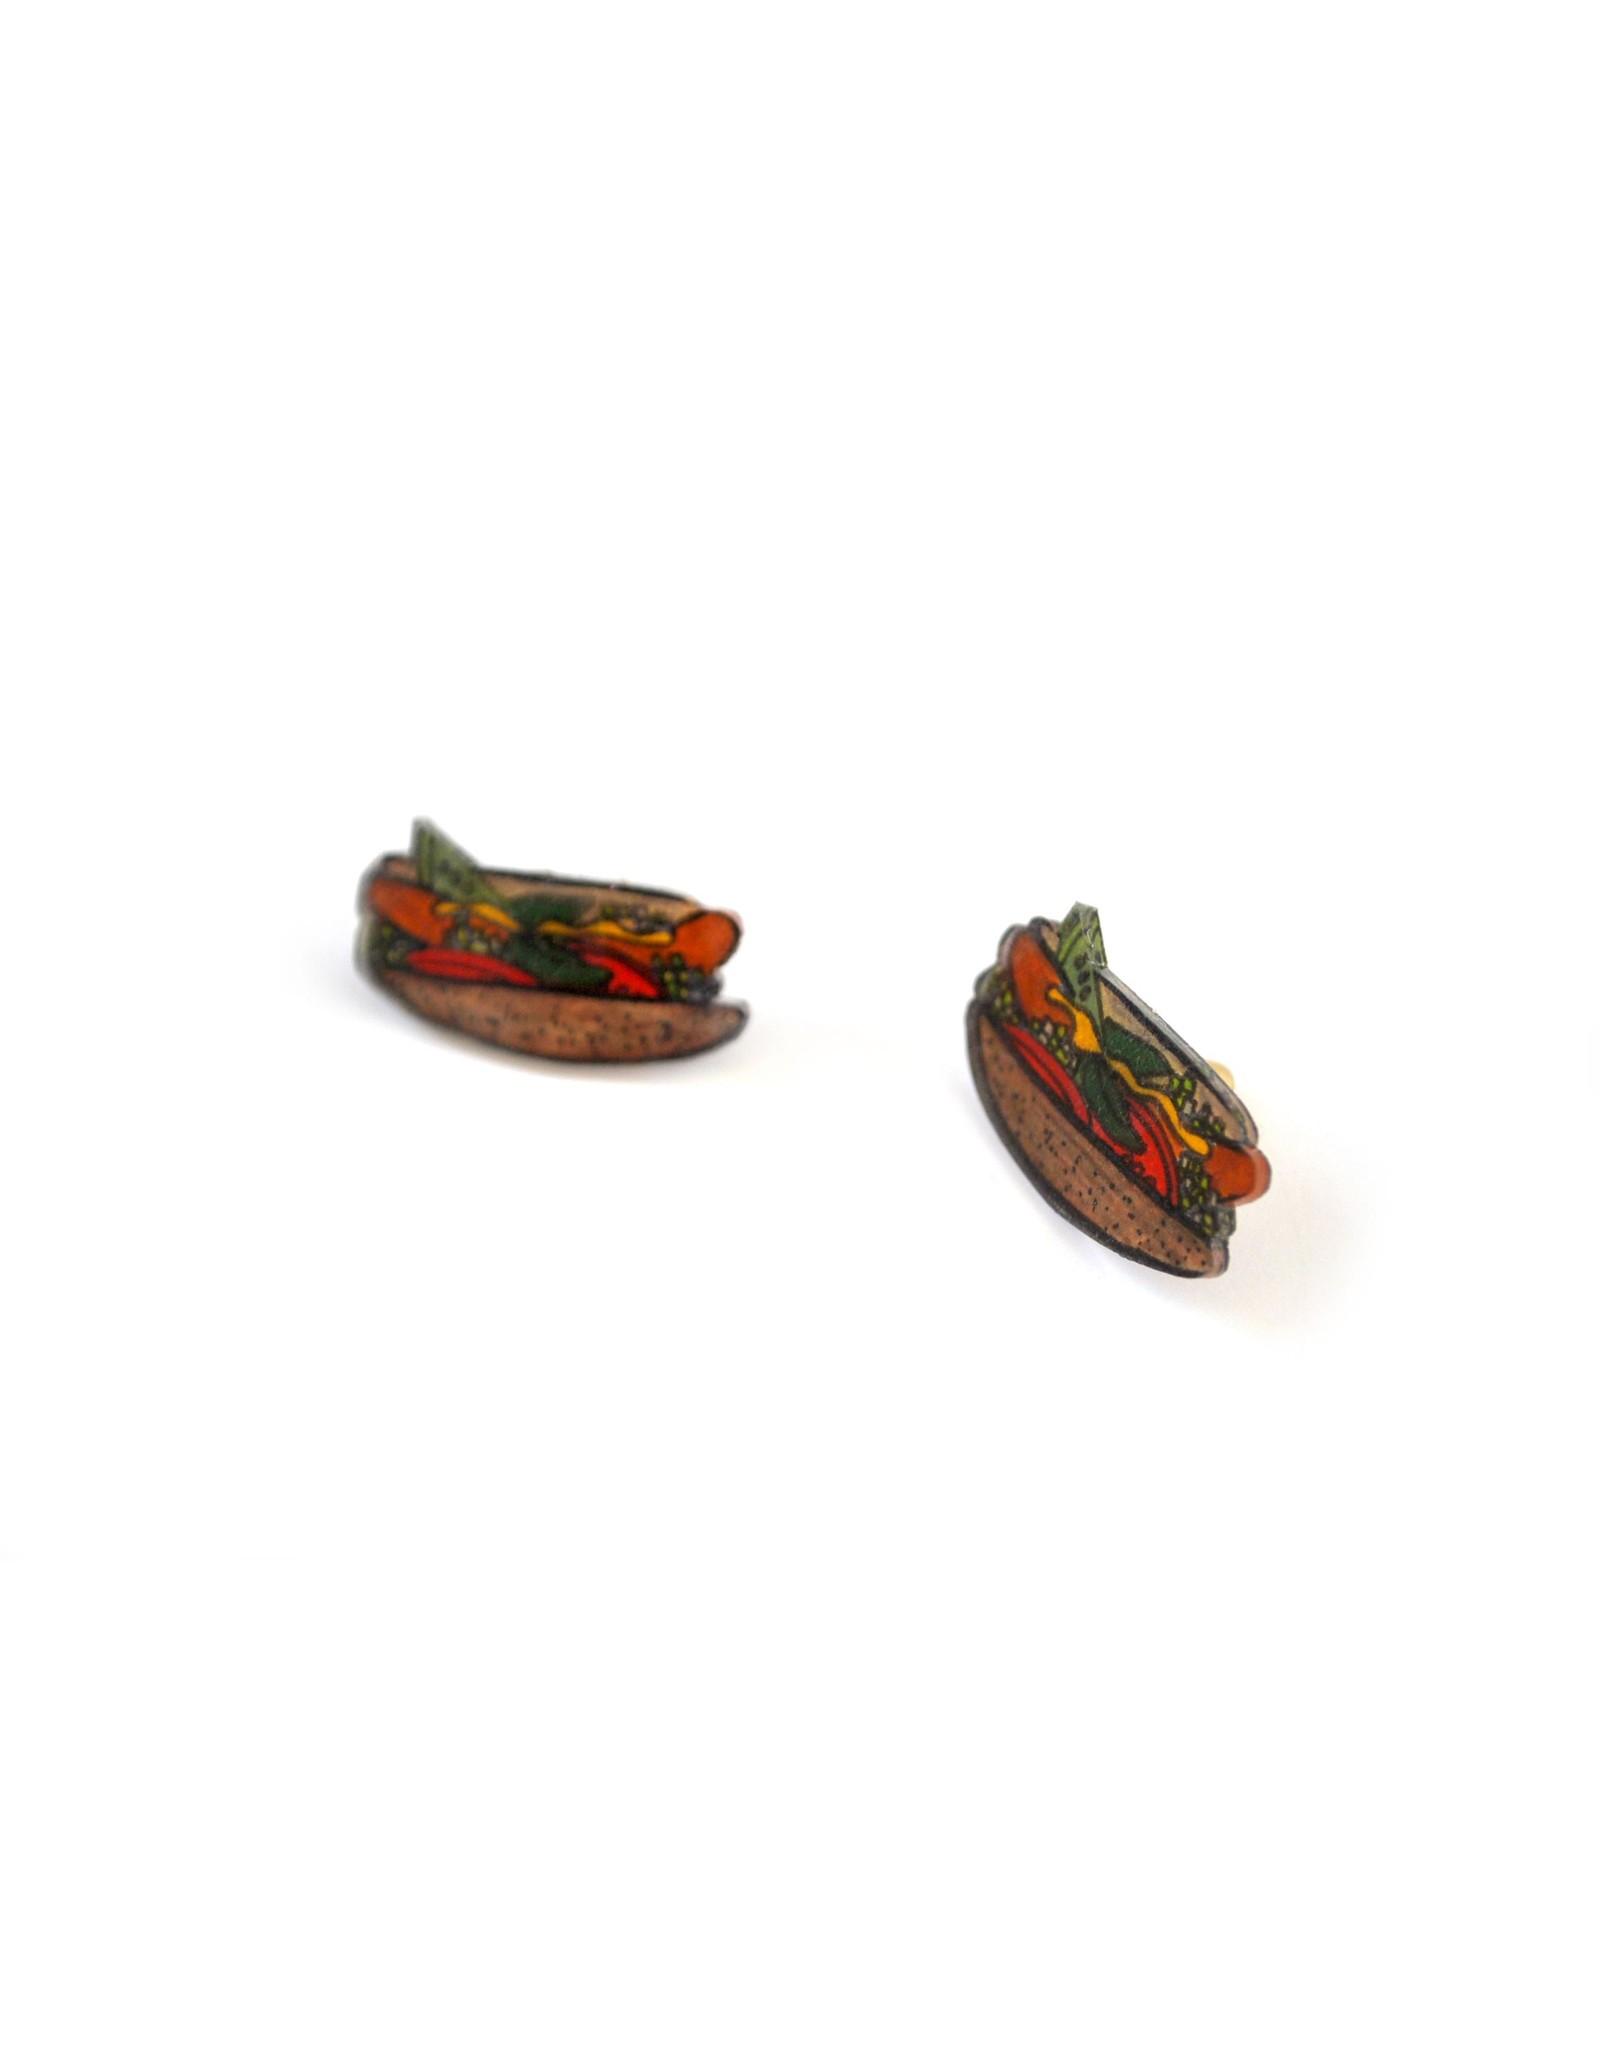 Chicago Hotdog Earrings by all the kitties love me